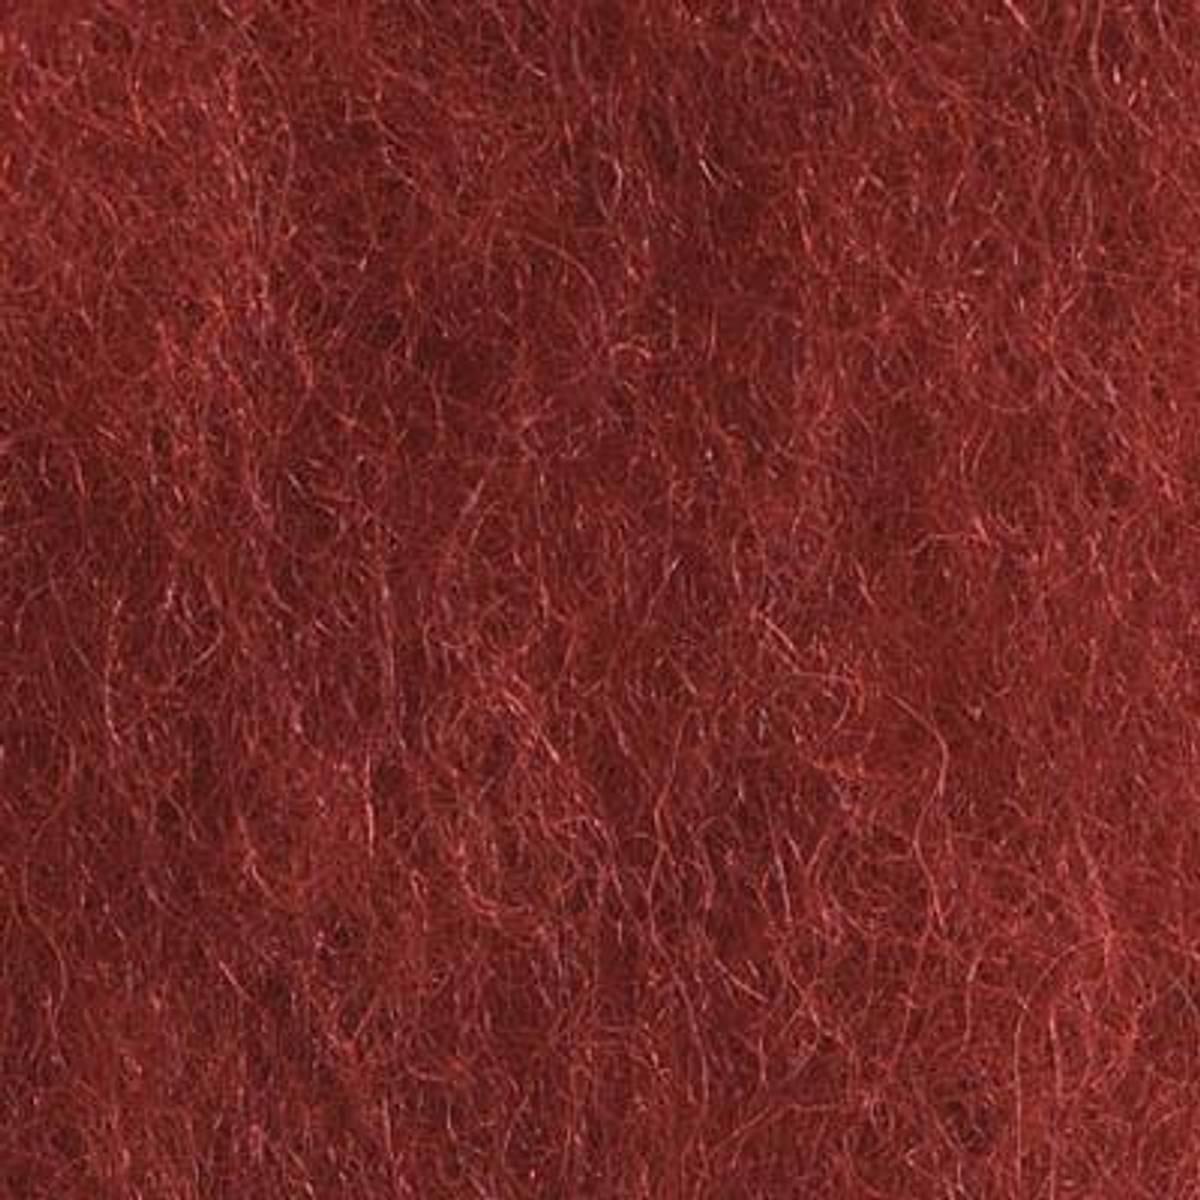 Kardet ull, dyp rød 100g